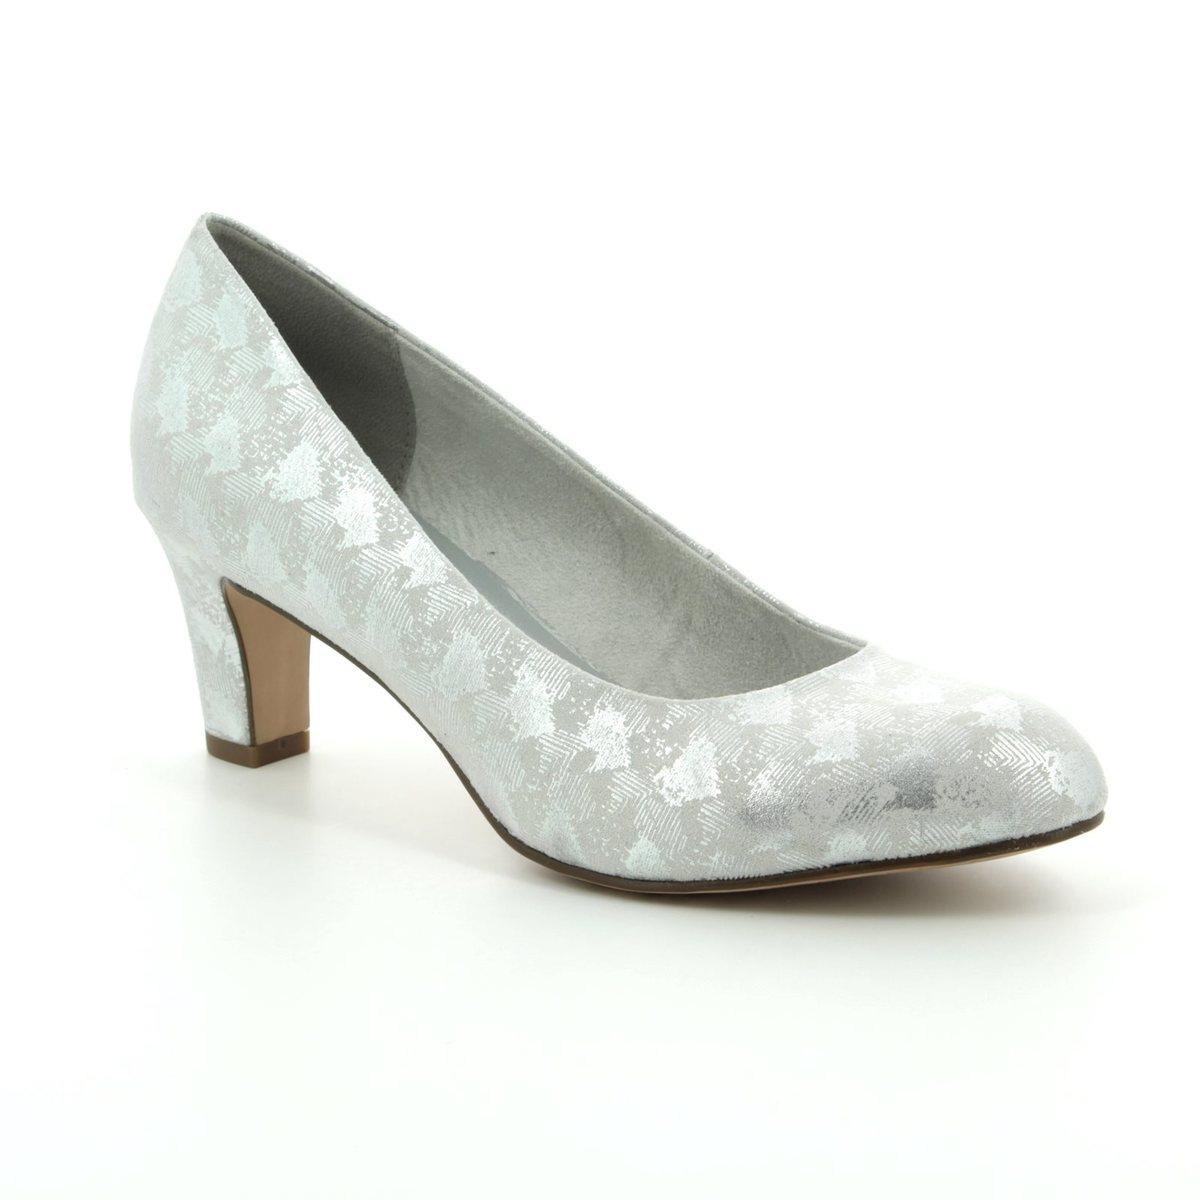 Tamaris High-heeled Shoes - Silver - 22418 20 927 CAXIAS 81 8b1fbe1f08